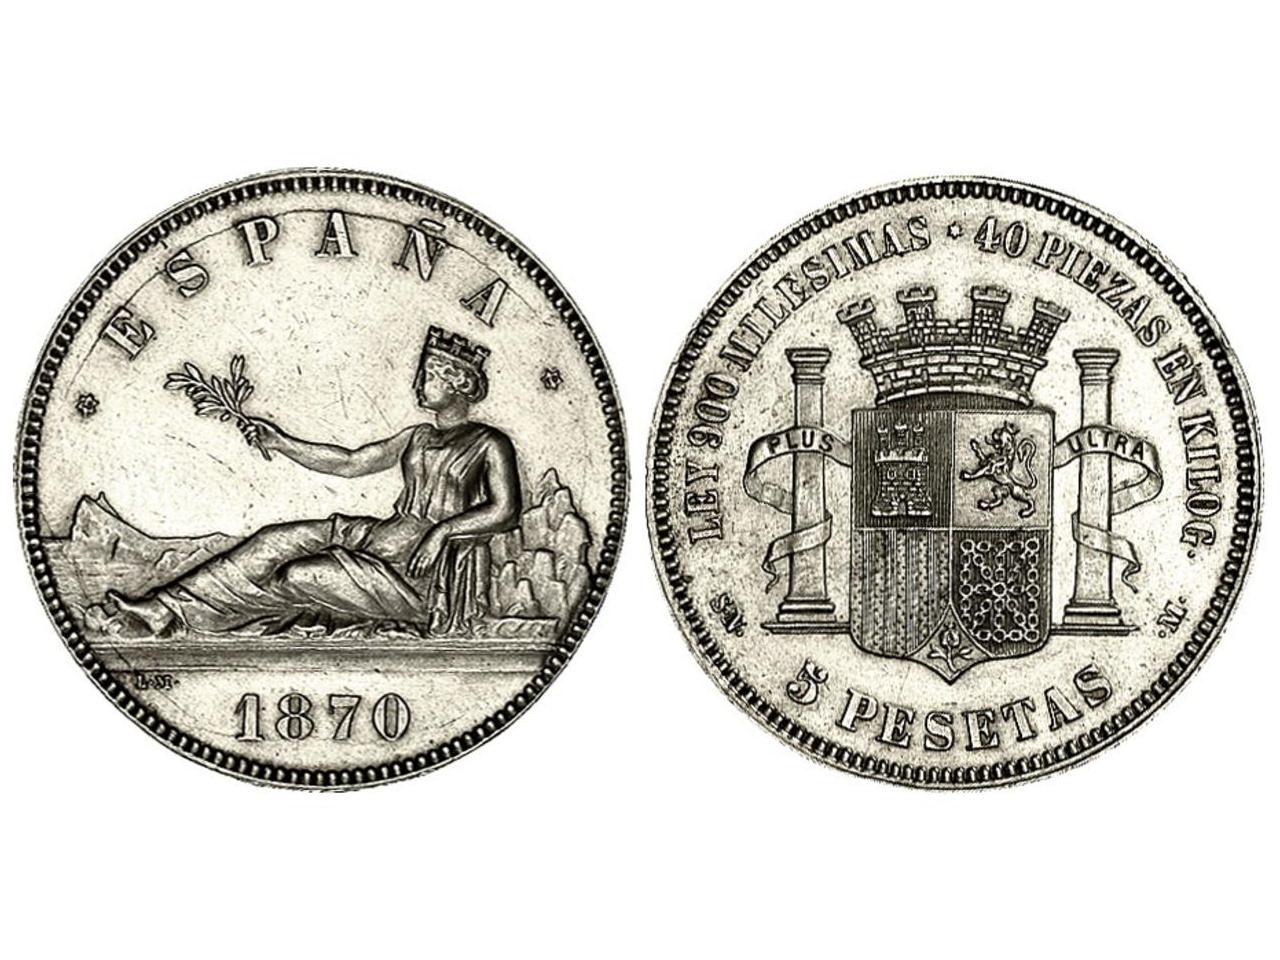 Gobierno Provisional - 5 pesetas - ¿Cuño diferente? 5_pesetas_1870_SC